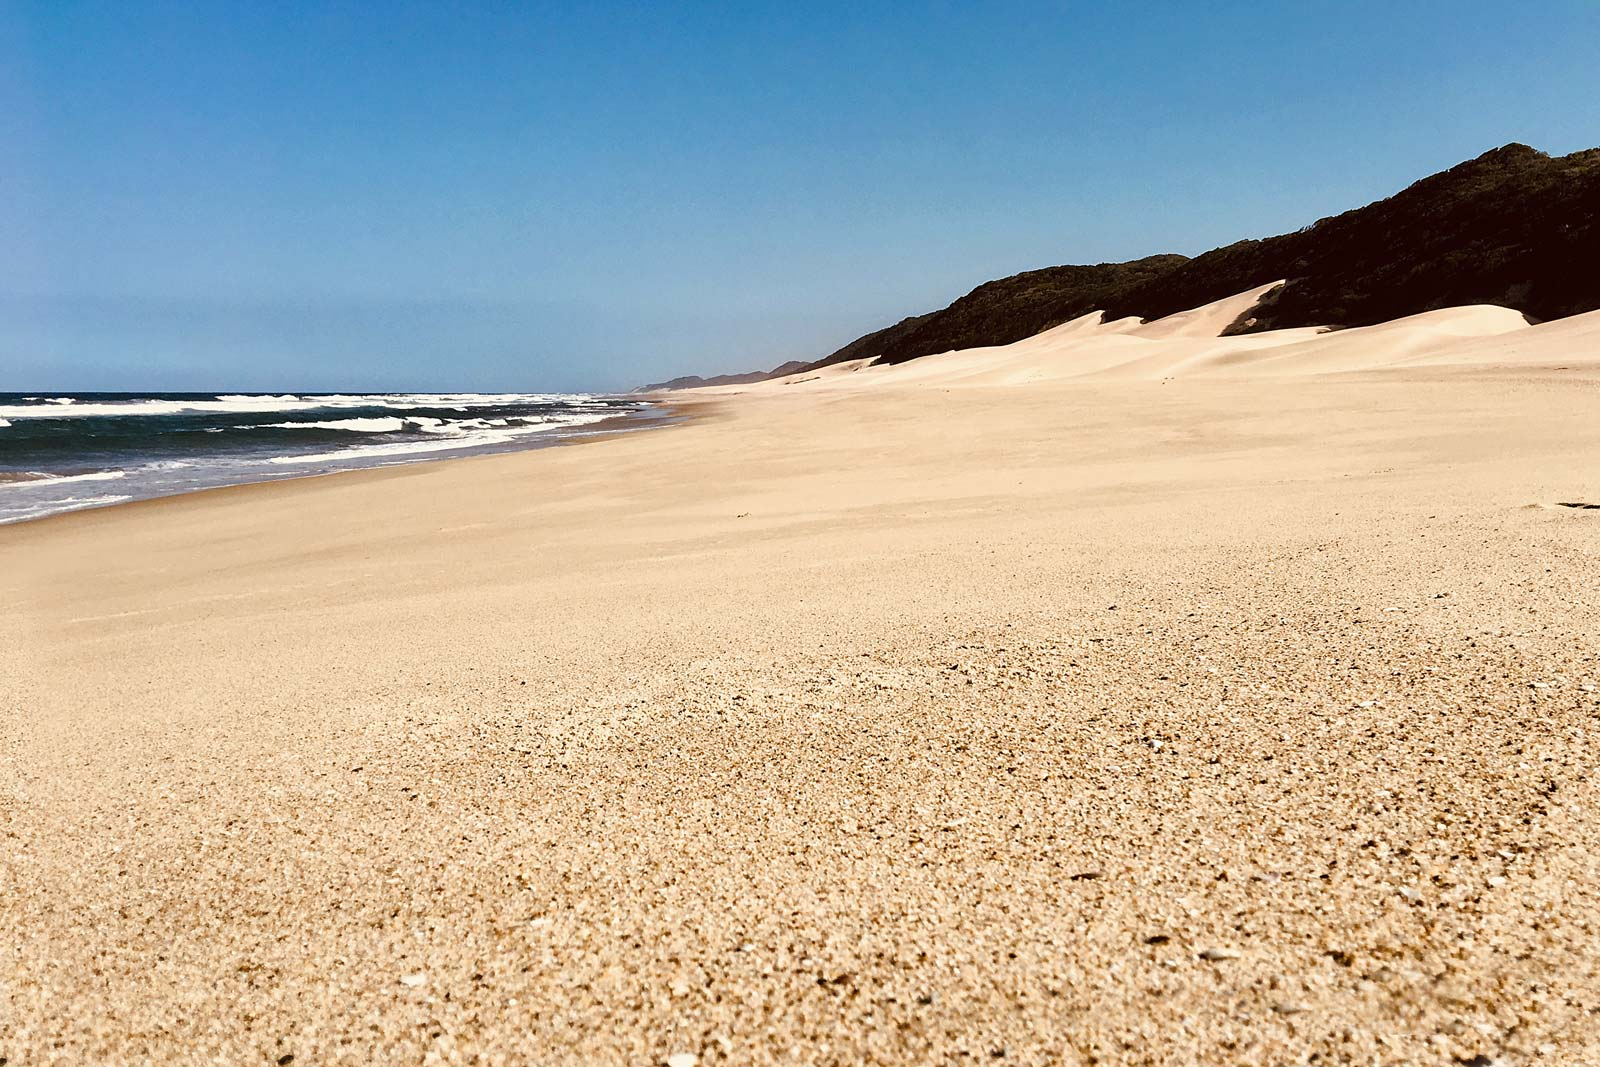 Menschenleerer Strand in Sodwana Bay